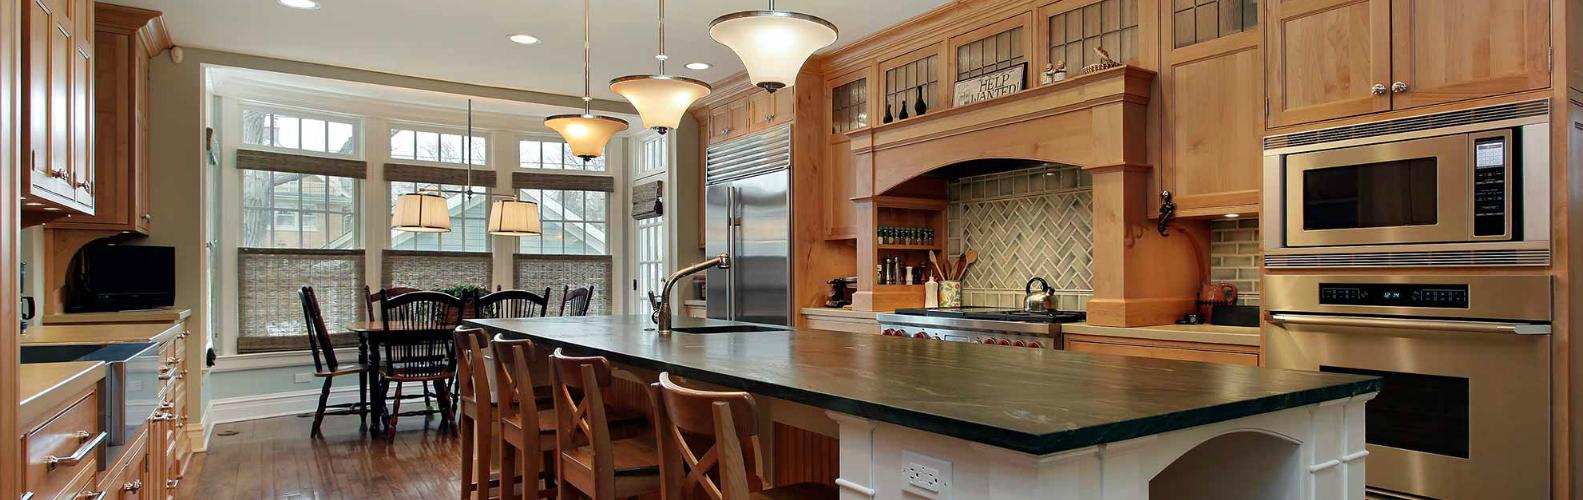 Idea Gallery - Kitchens